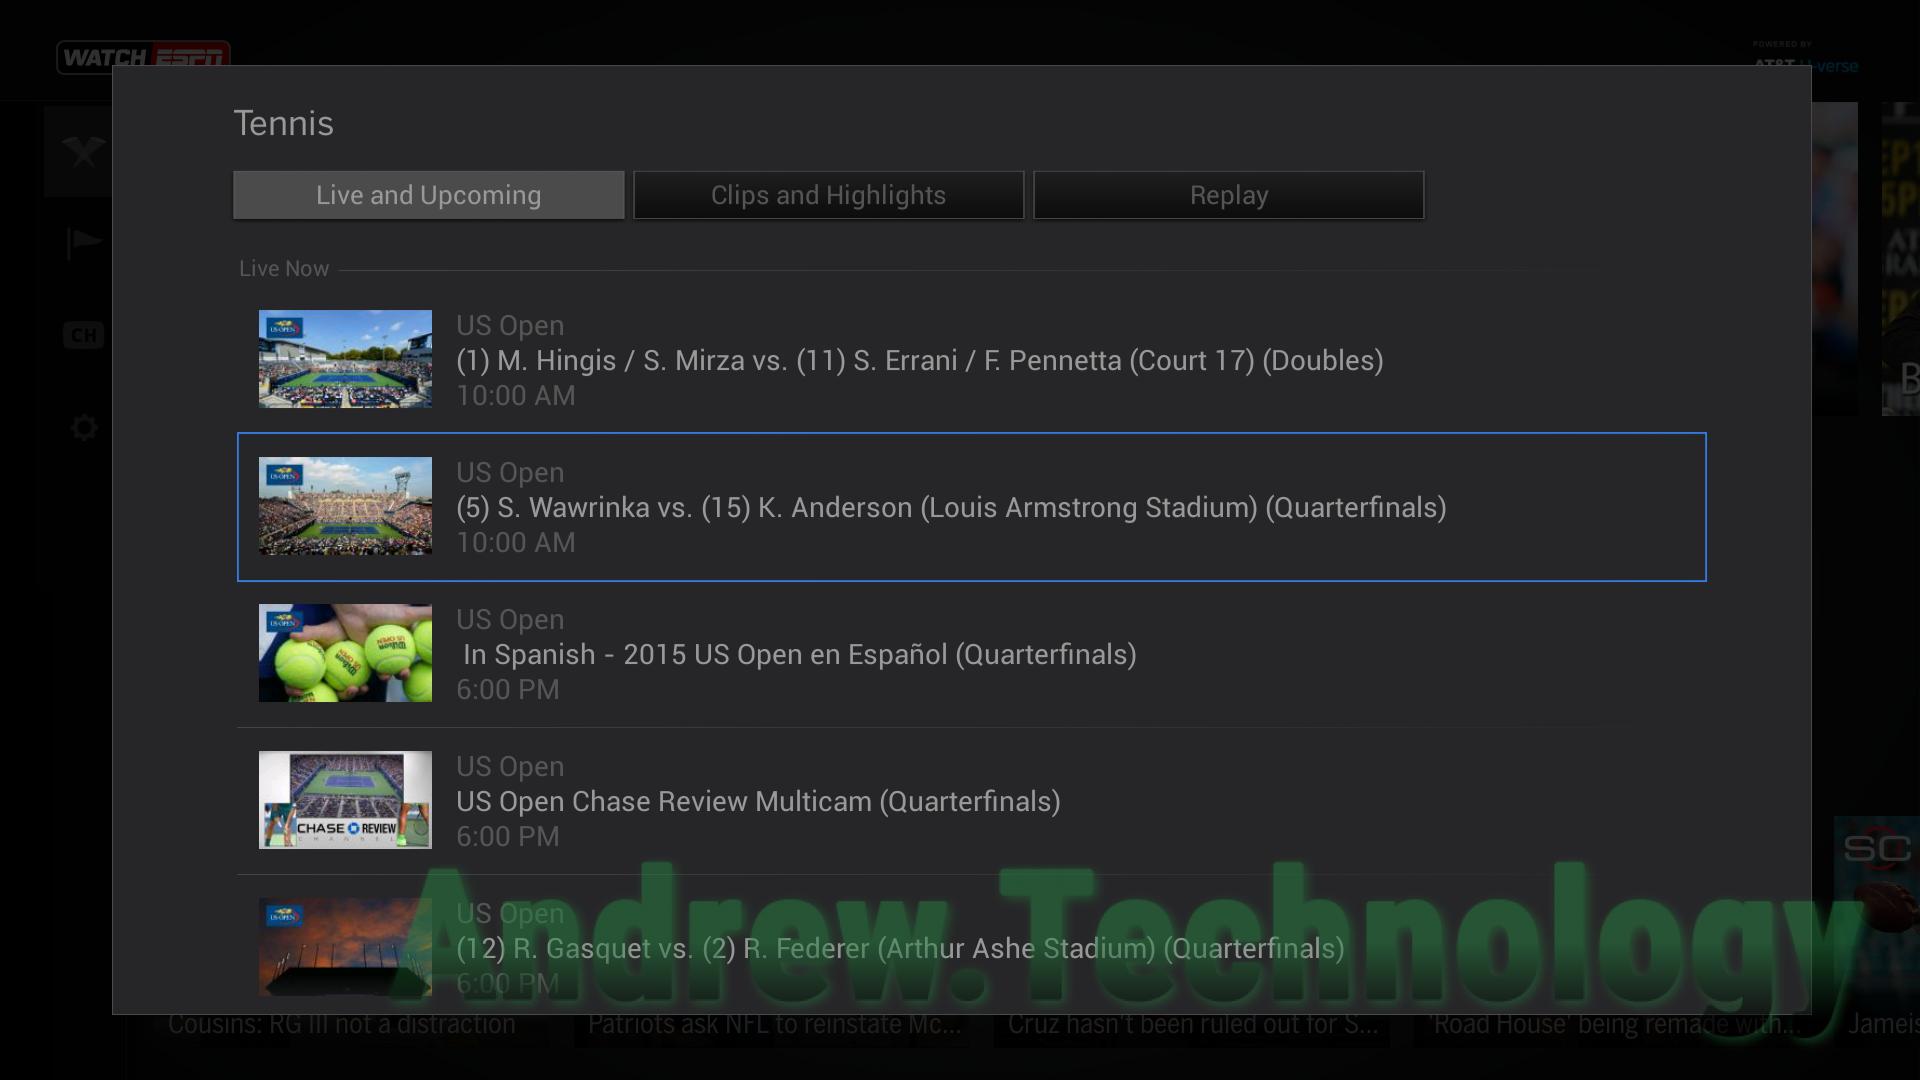 WatchESPN FireTV US Open (5) S. Wawrink vs. (15) K. Anderson (Louis Armstrong Stadium) (Quarterfinals)